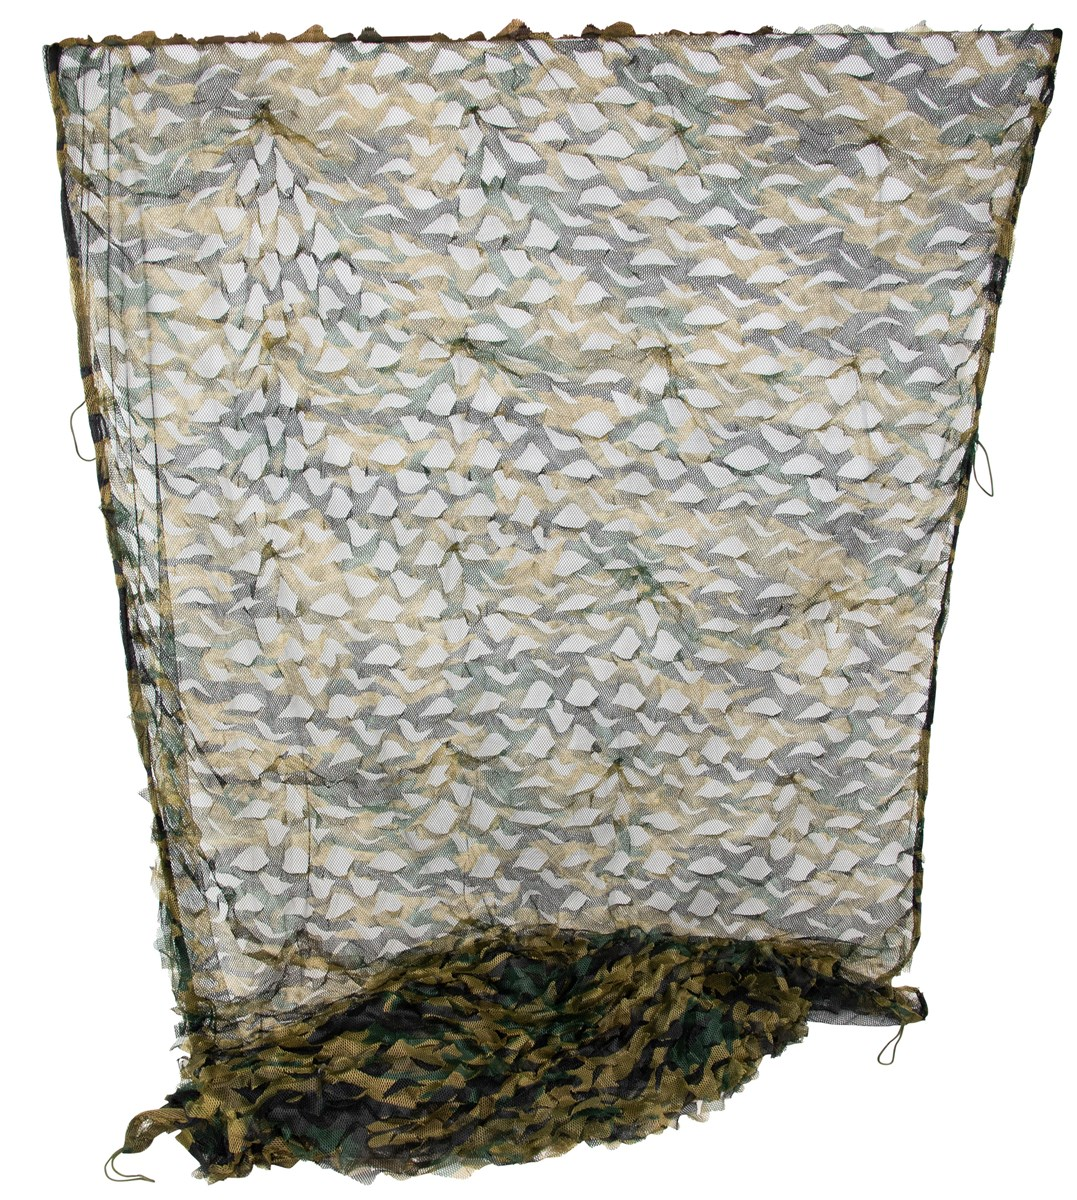 Hubertus camouflage net